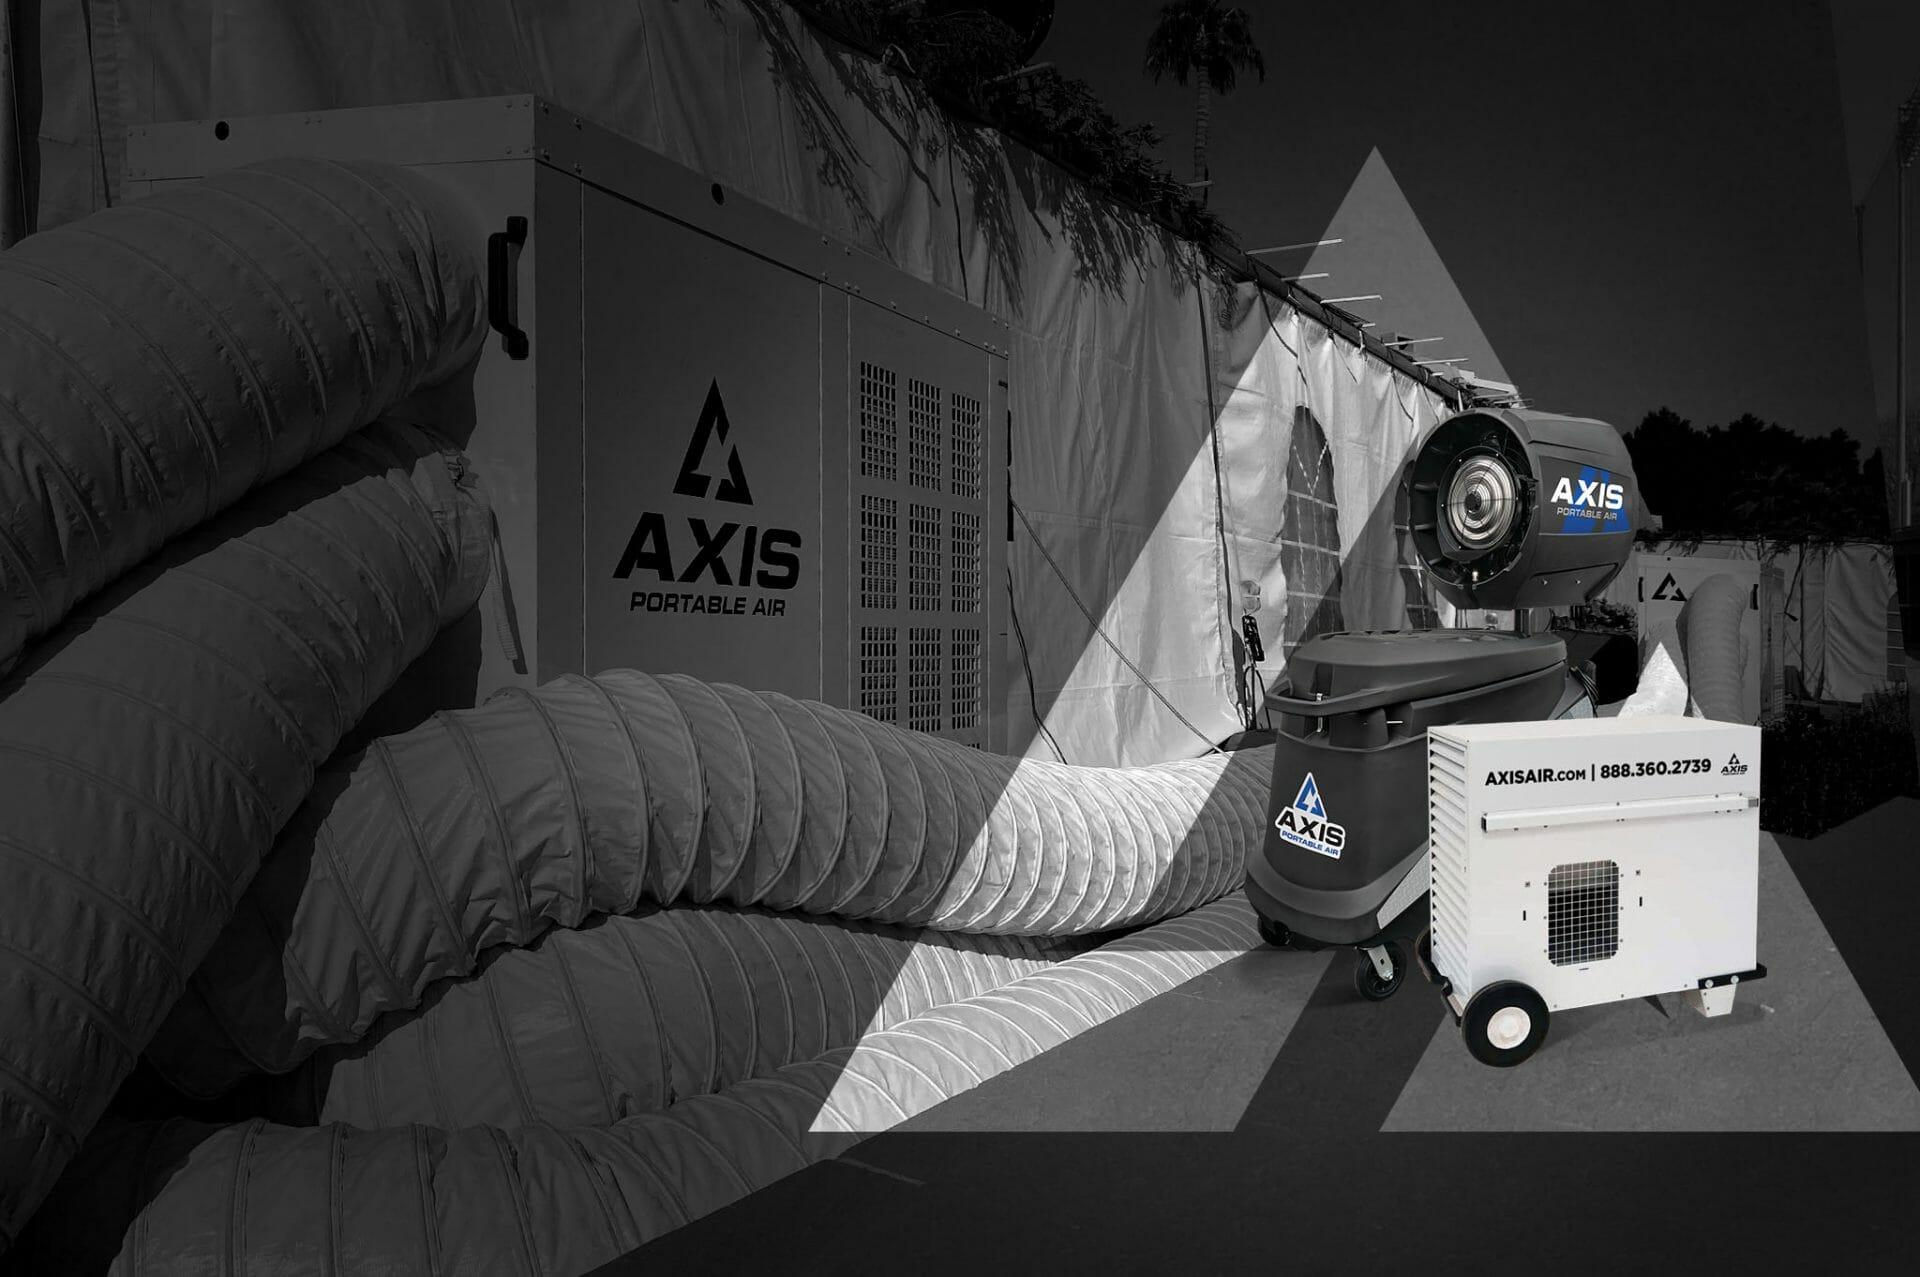 Axis Portable Air Outdoor Events